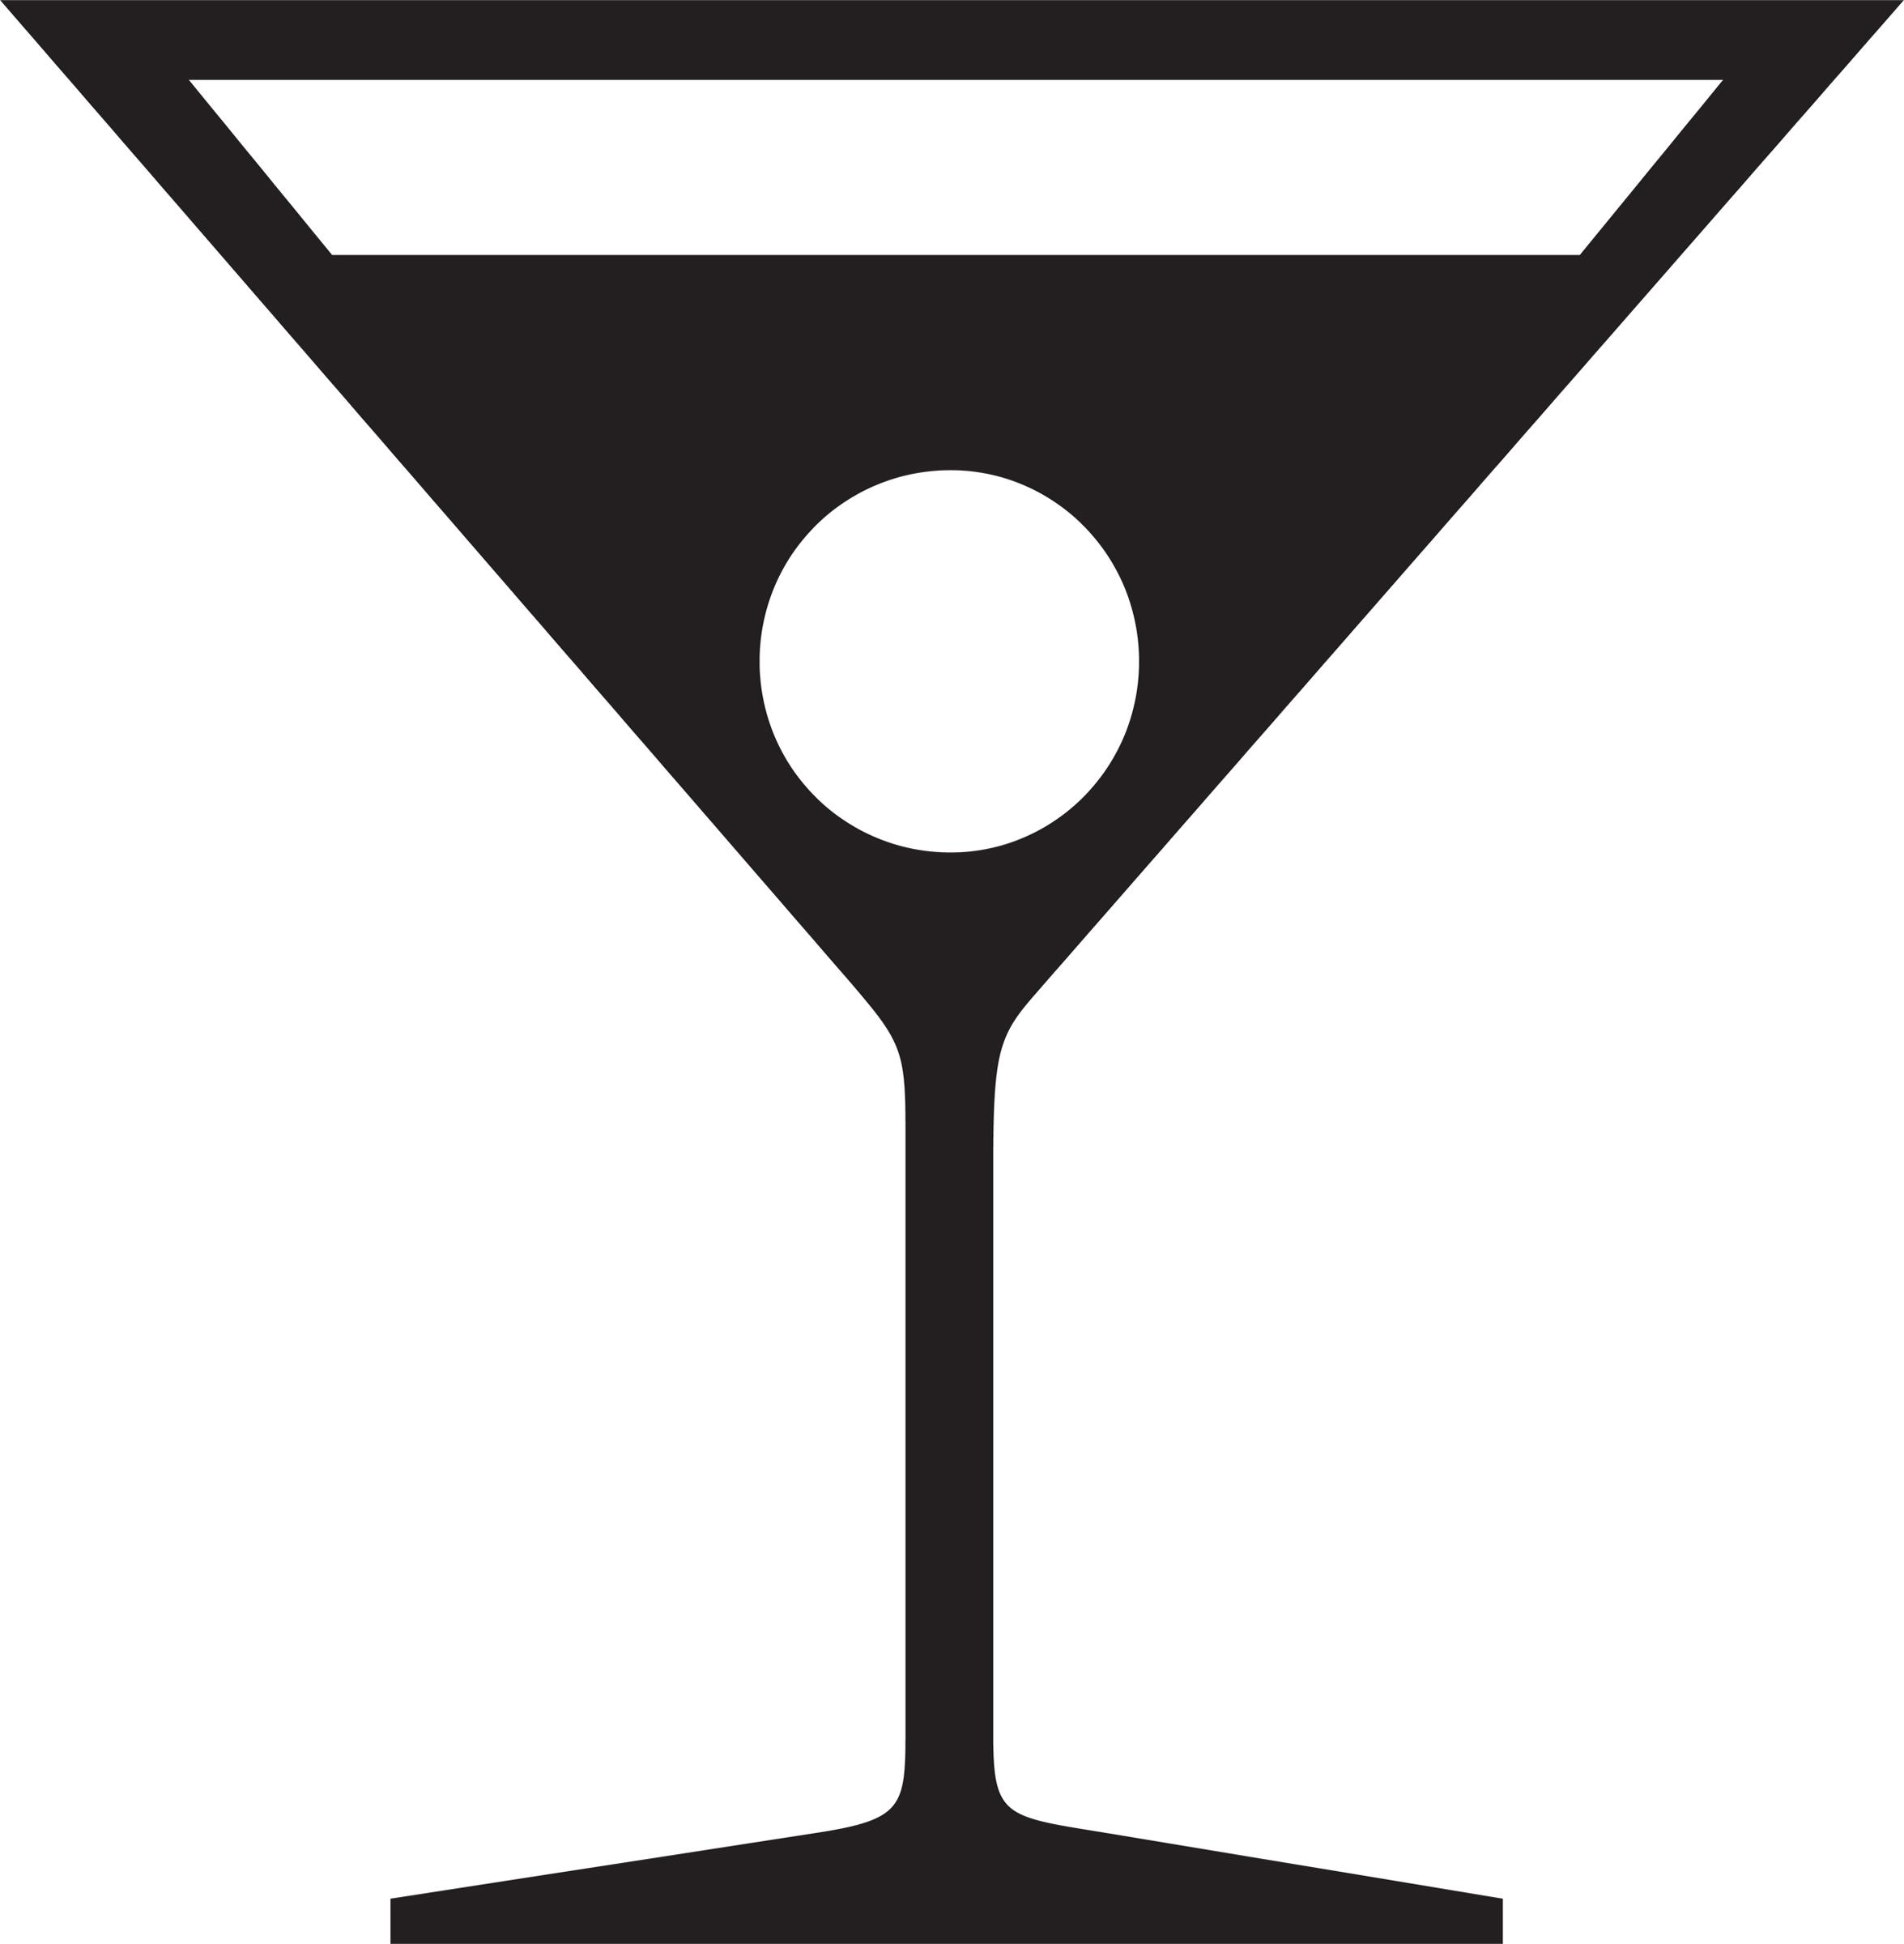 Margarita cocktail glass clipart